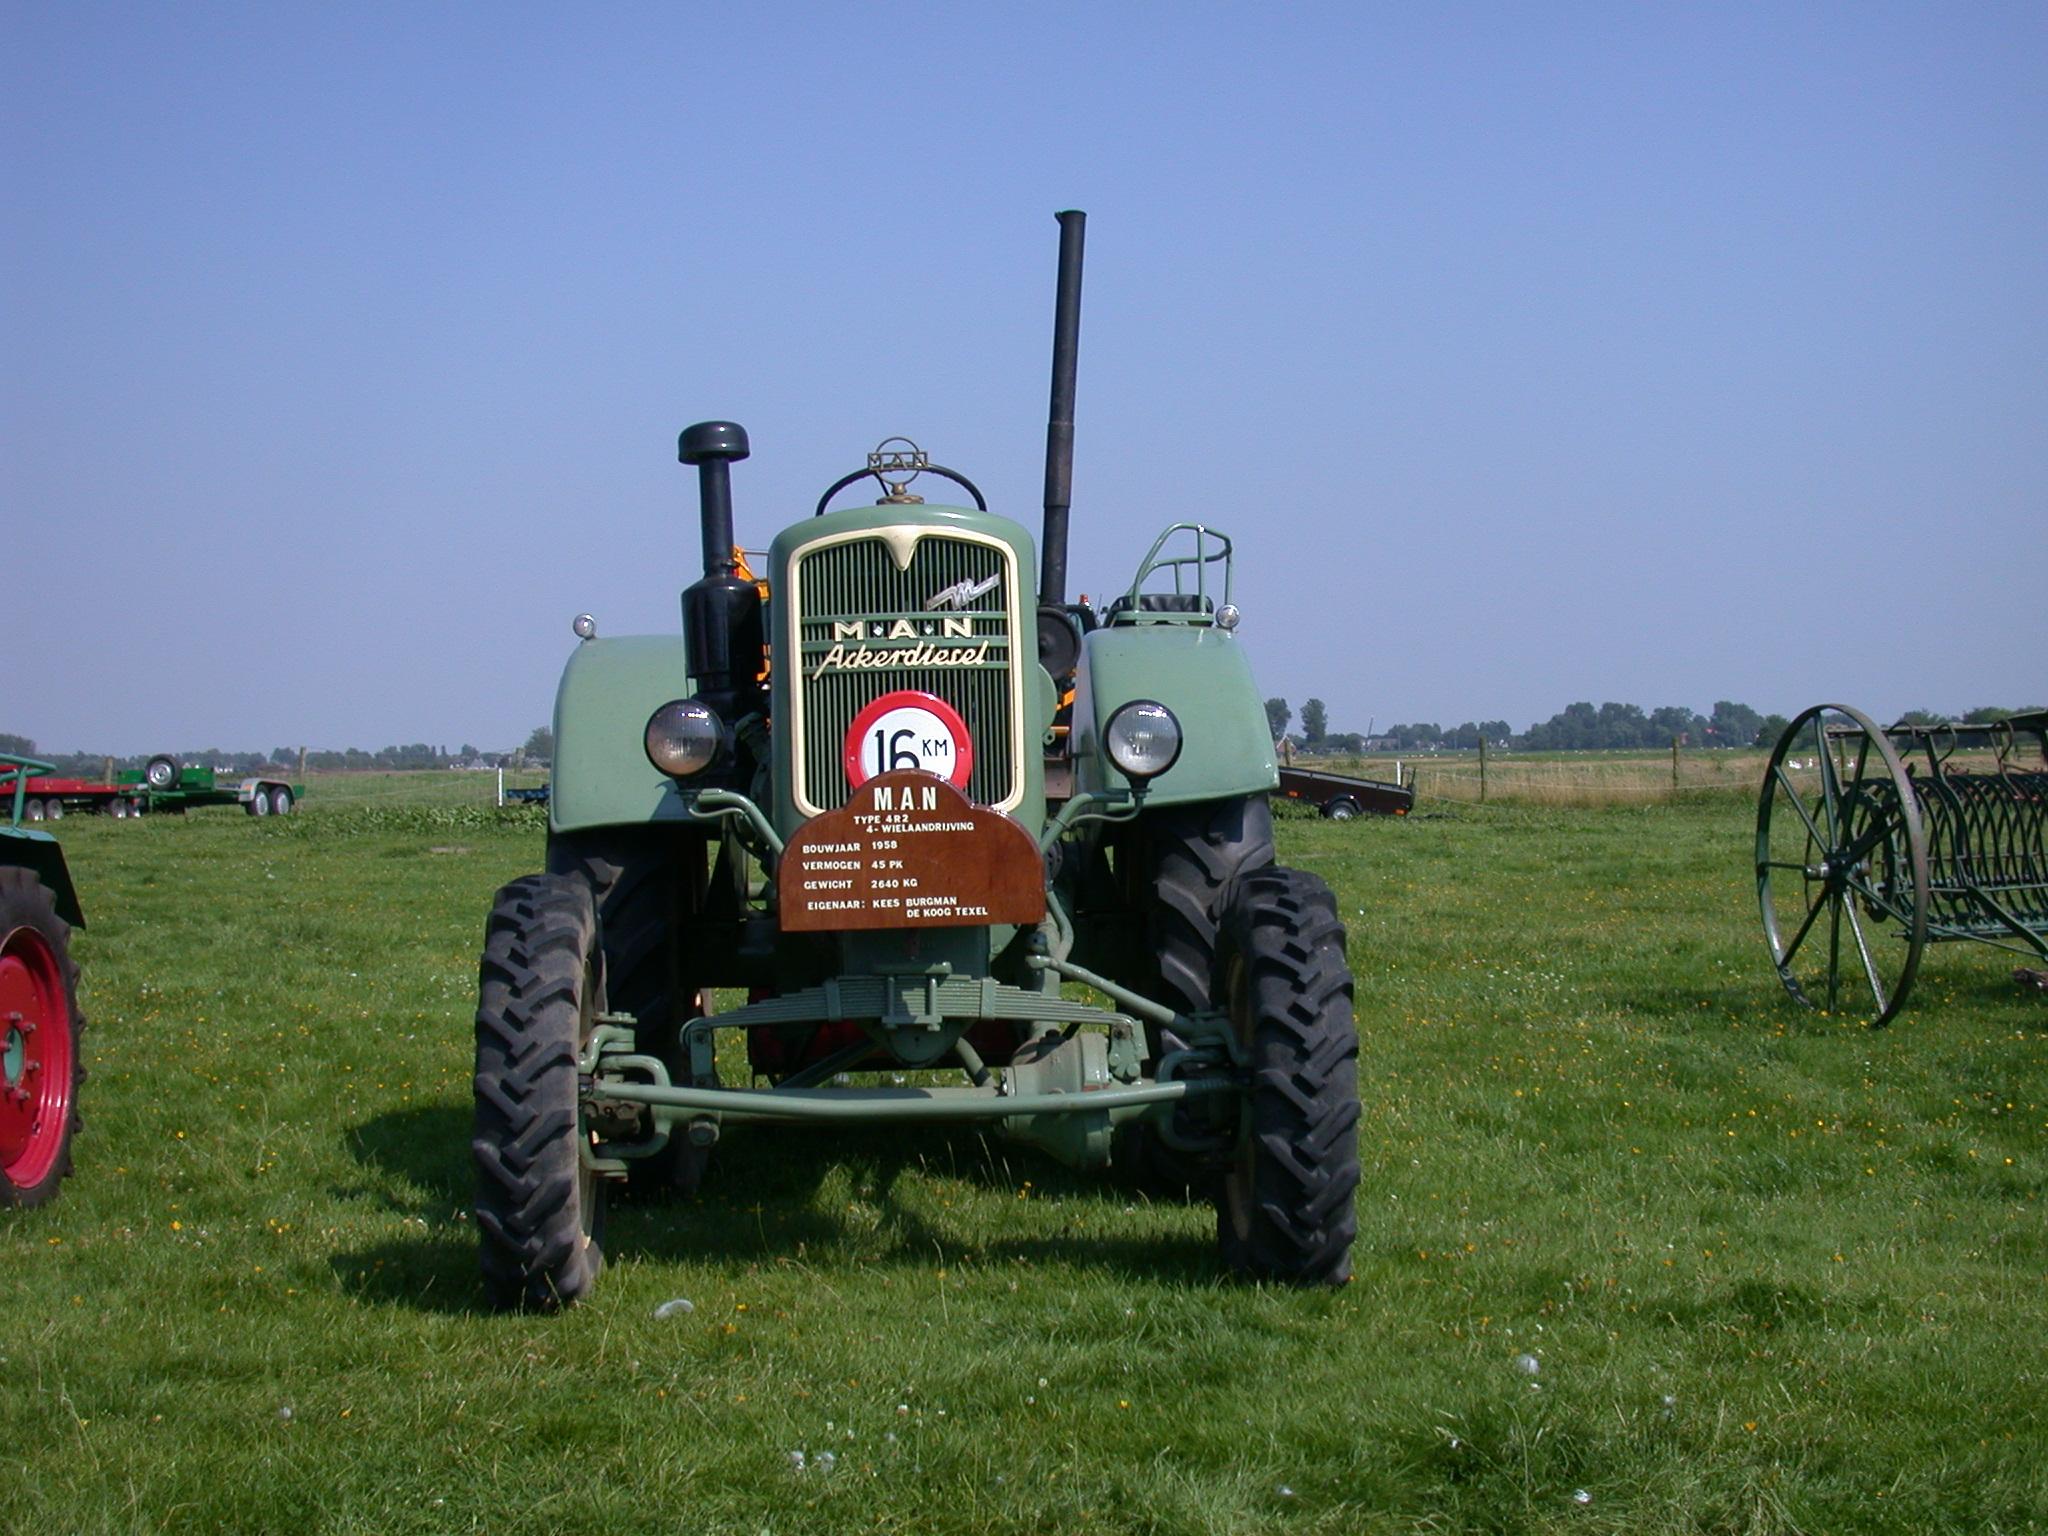 tracktor farm equipment Agricultural vehicle grass land